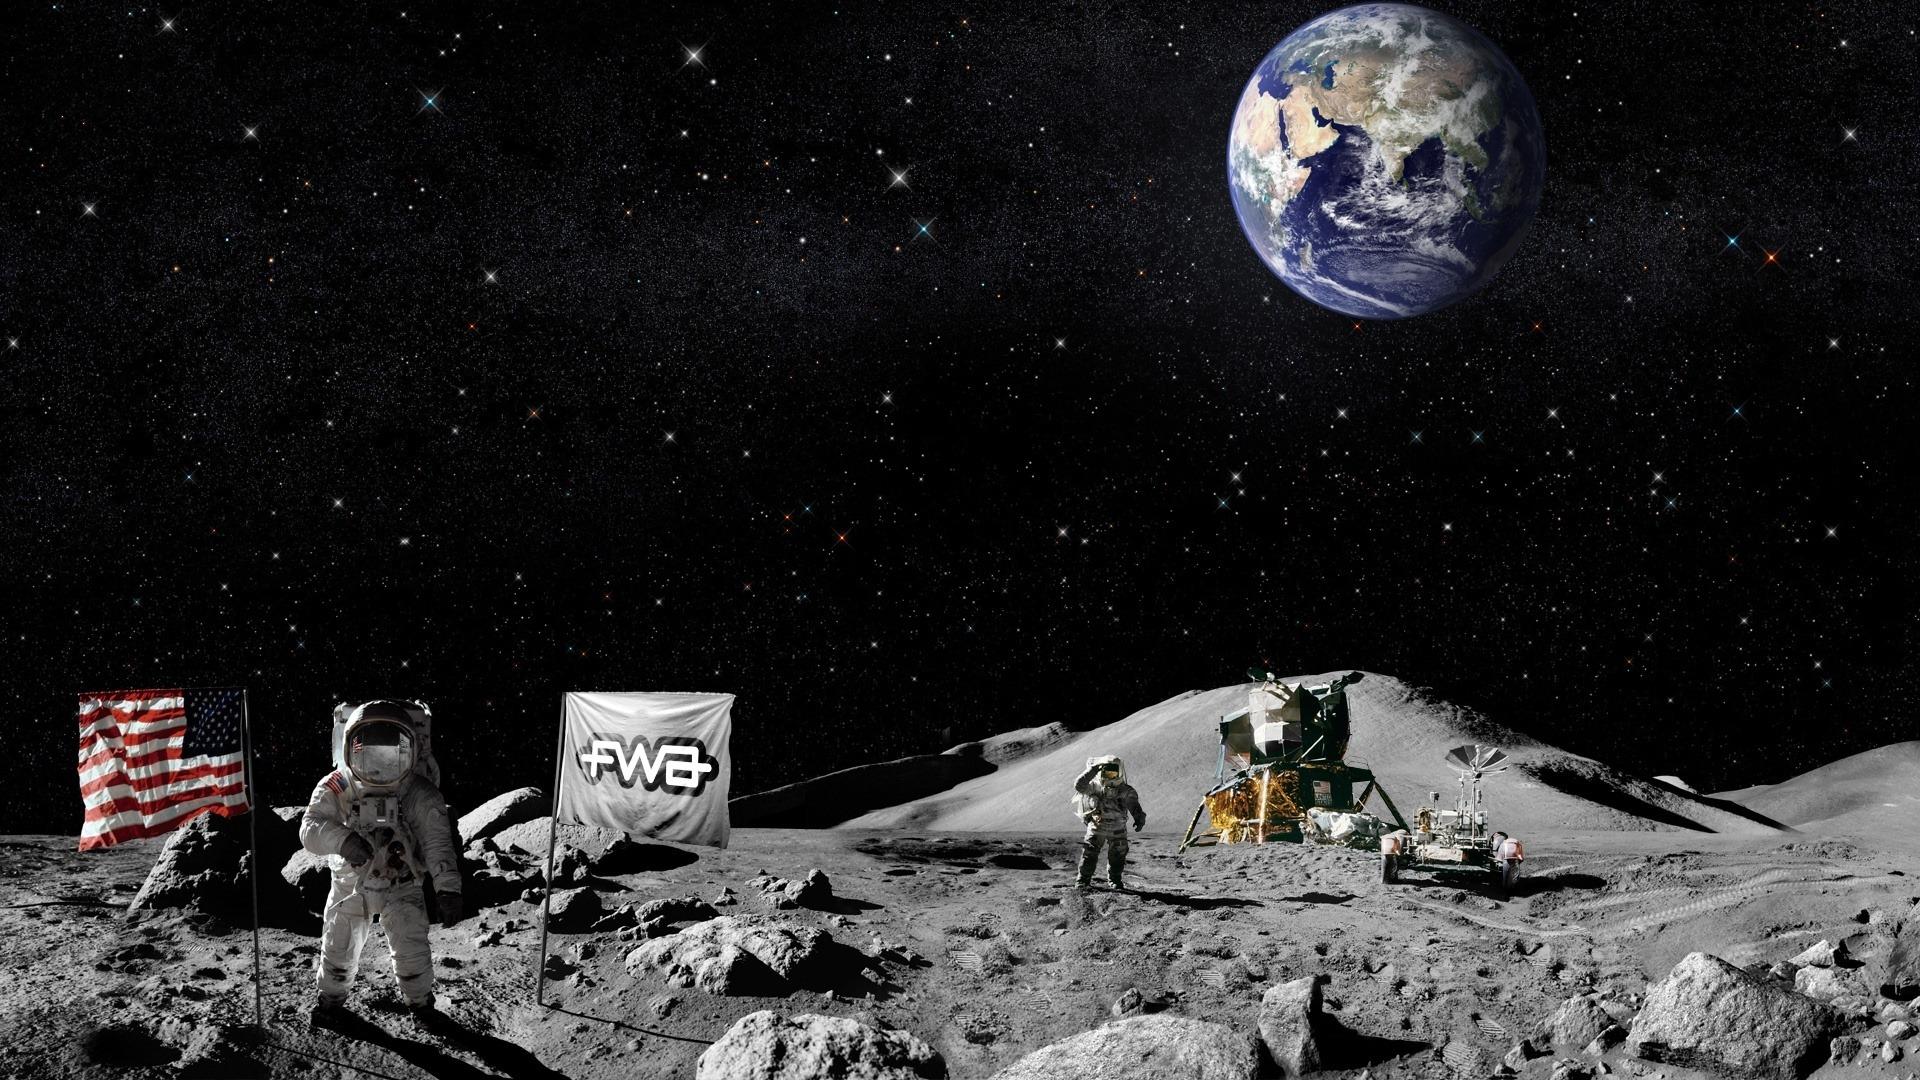 NASA Desktop Images Download HD Wallpapers 1920x1080